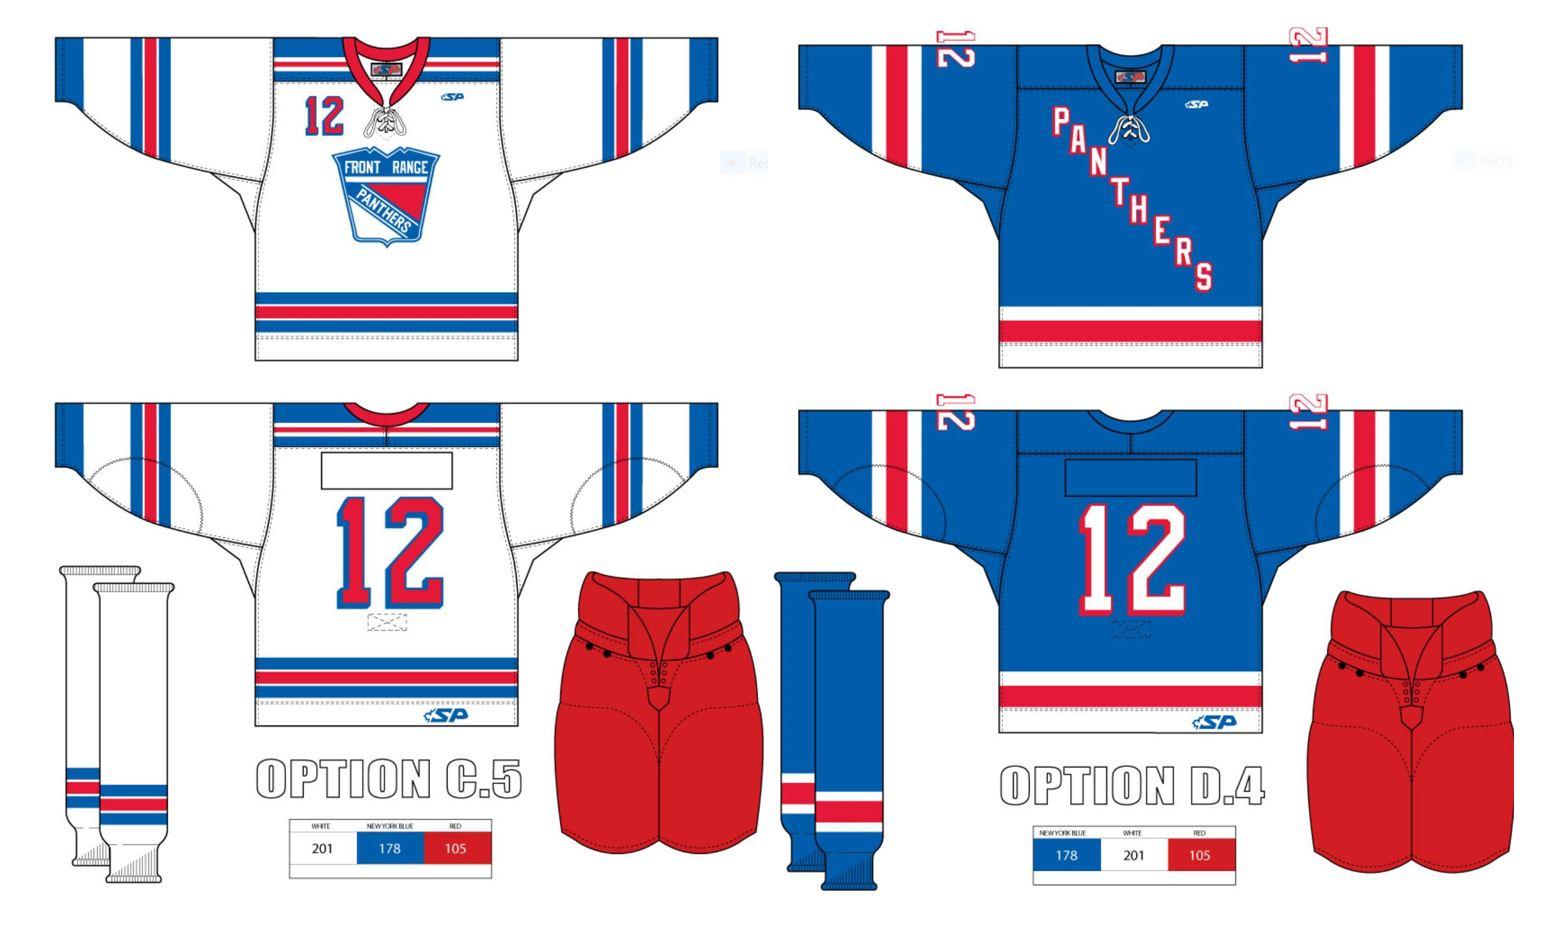 2009 Front Range Amateur Hockey Association